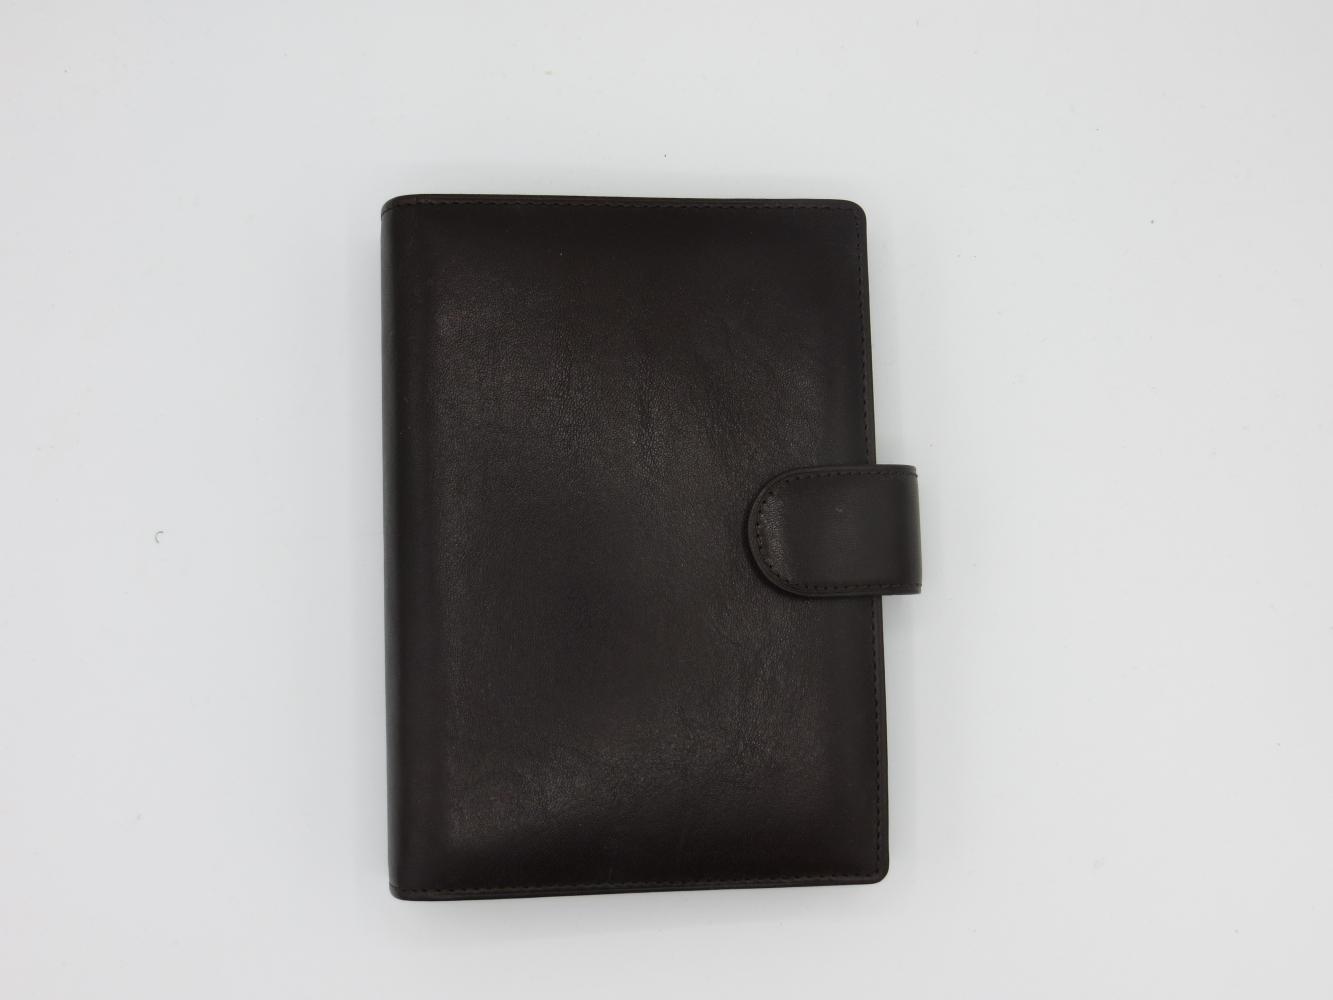 Pt320tc01,Succes omslag standaard 25 mm tuscany bruin